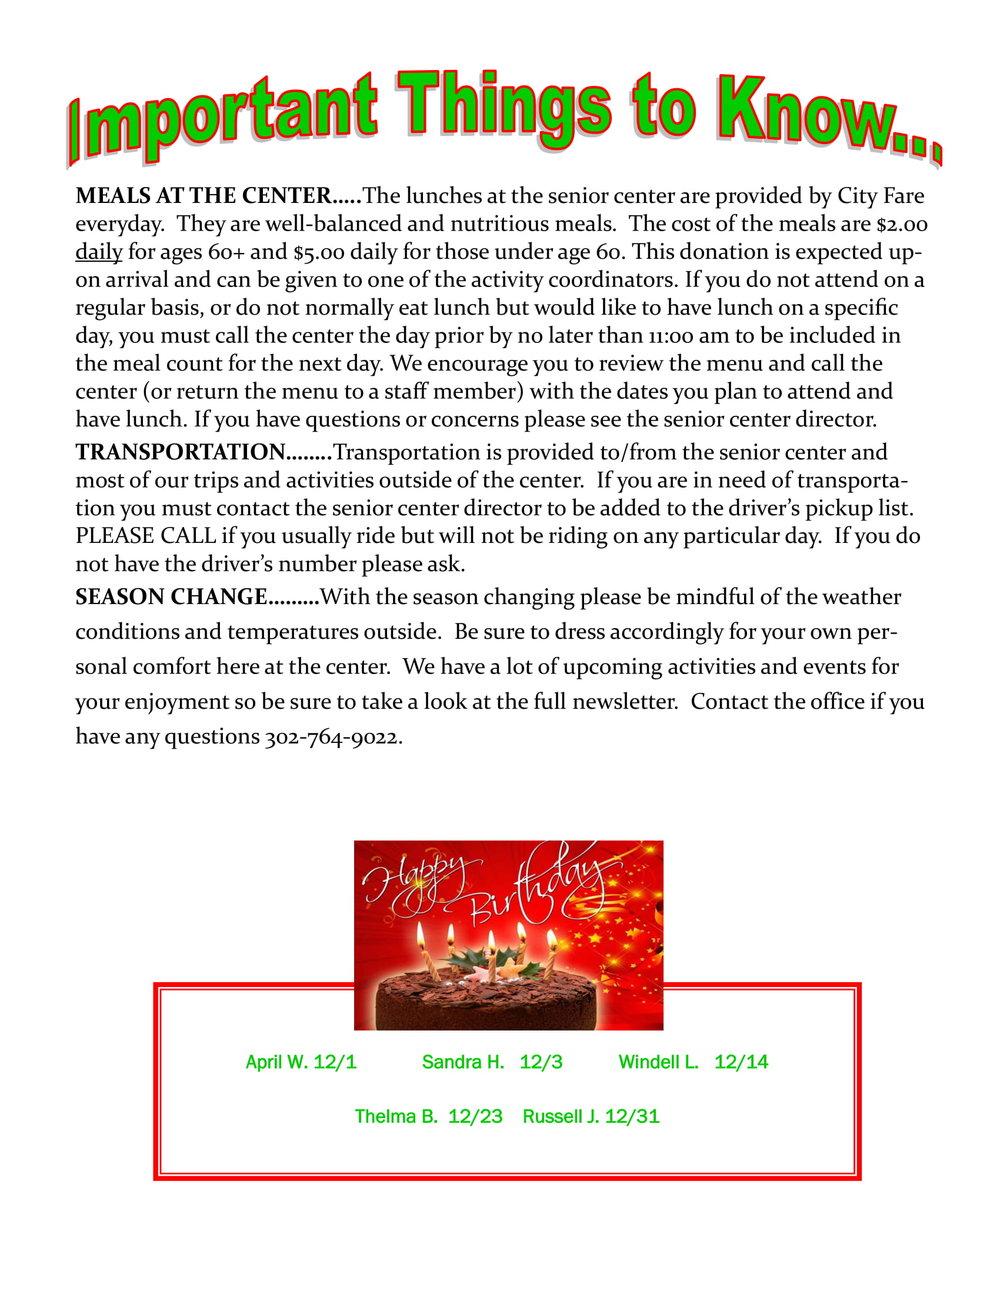 KCC December Newsletter 2018 updated 12.10.18_Part4-1.jpg